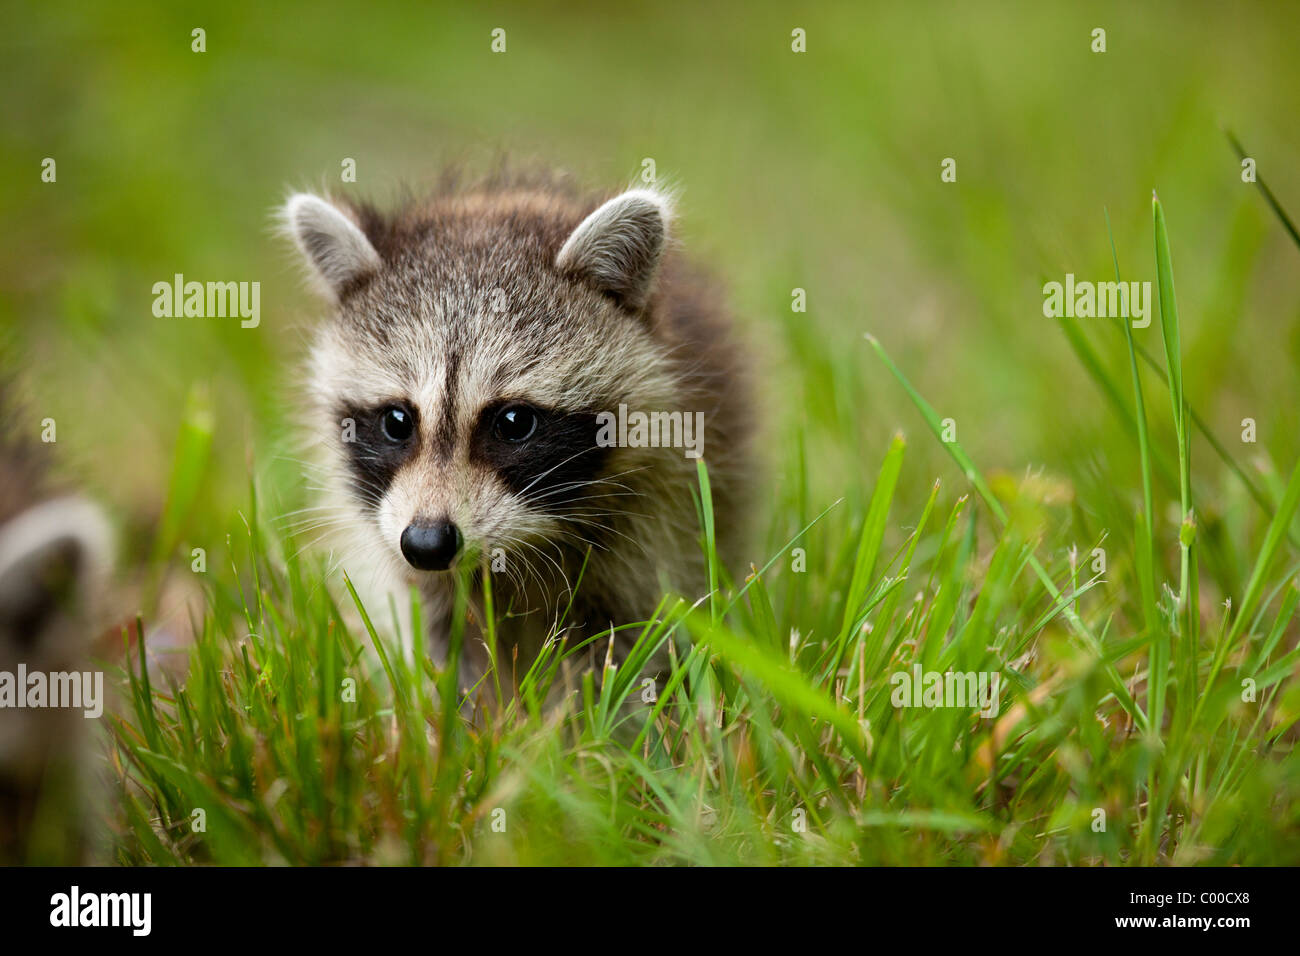 USA, Maryland, Assateague Island National Seashore, jeune raton laveur (Procyon lotor) marcher dans l'herbe Photo Stock